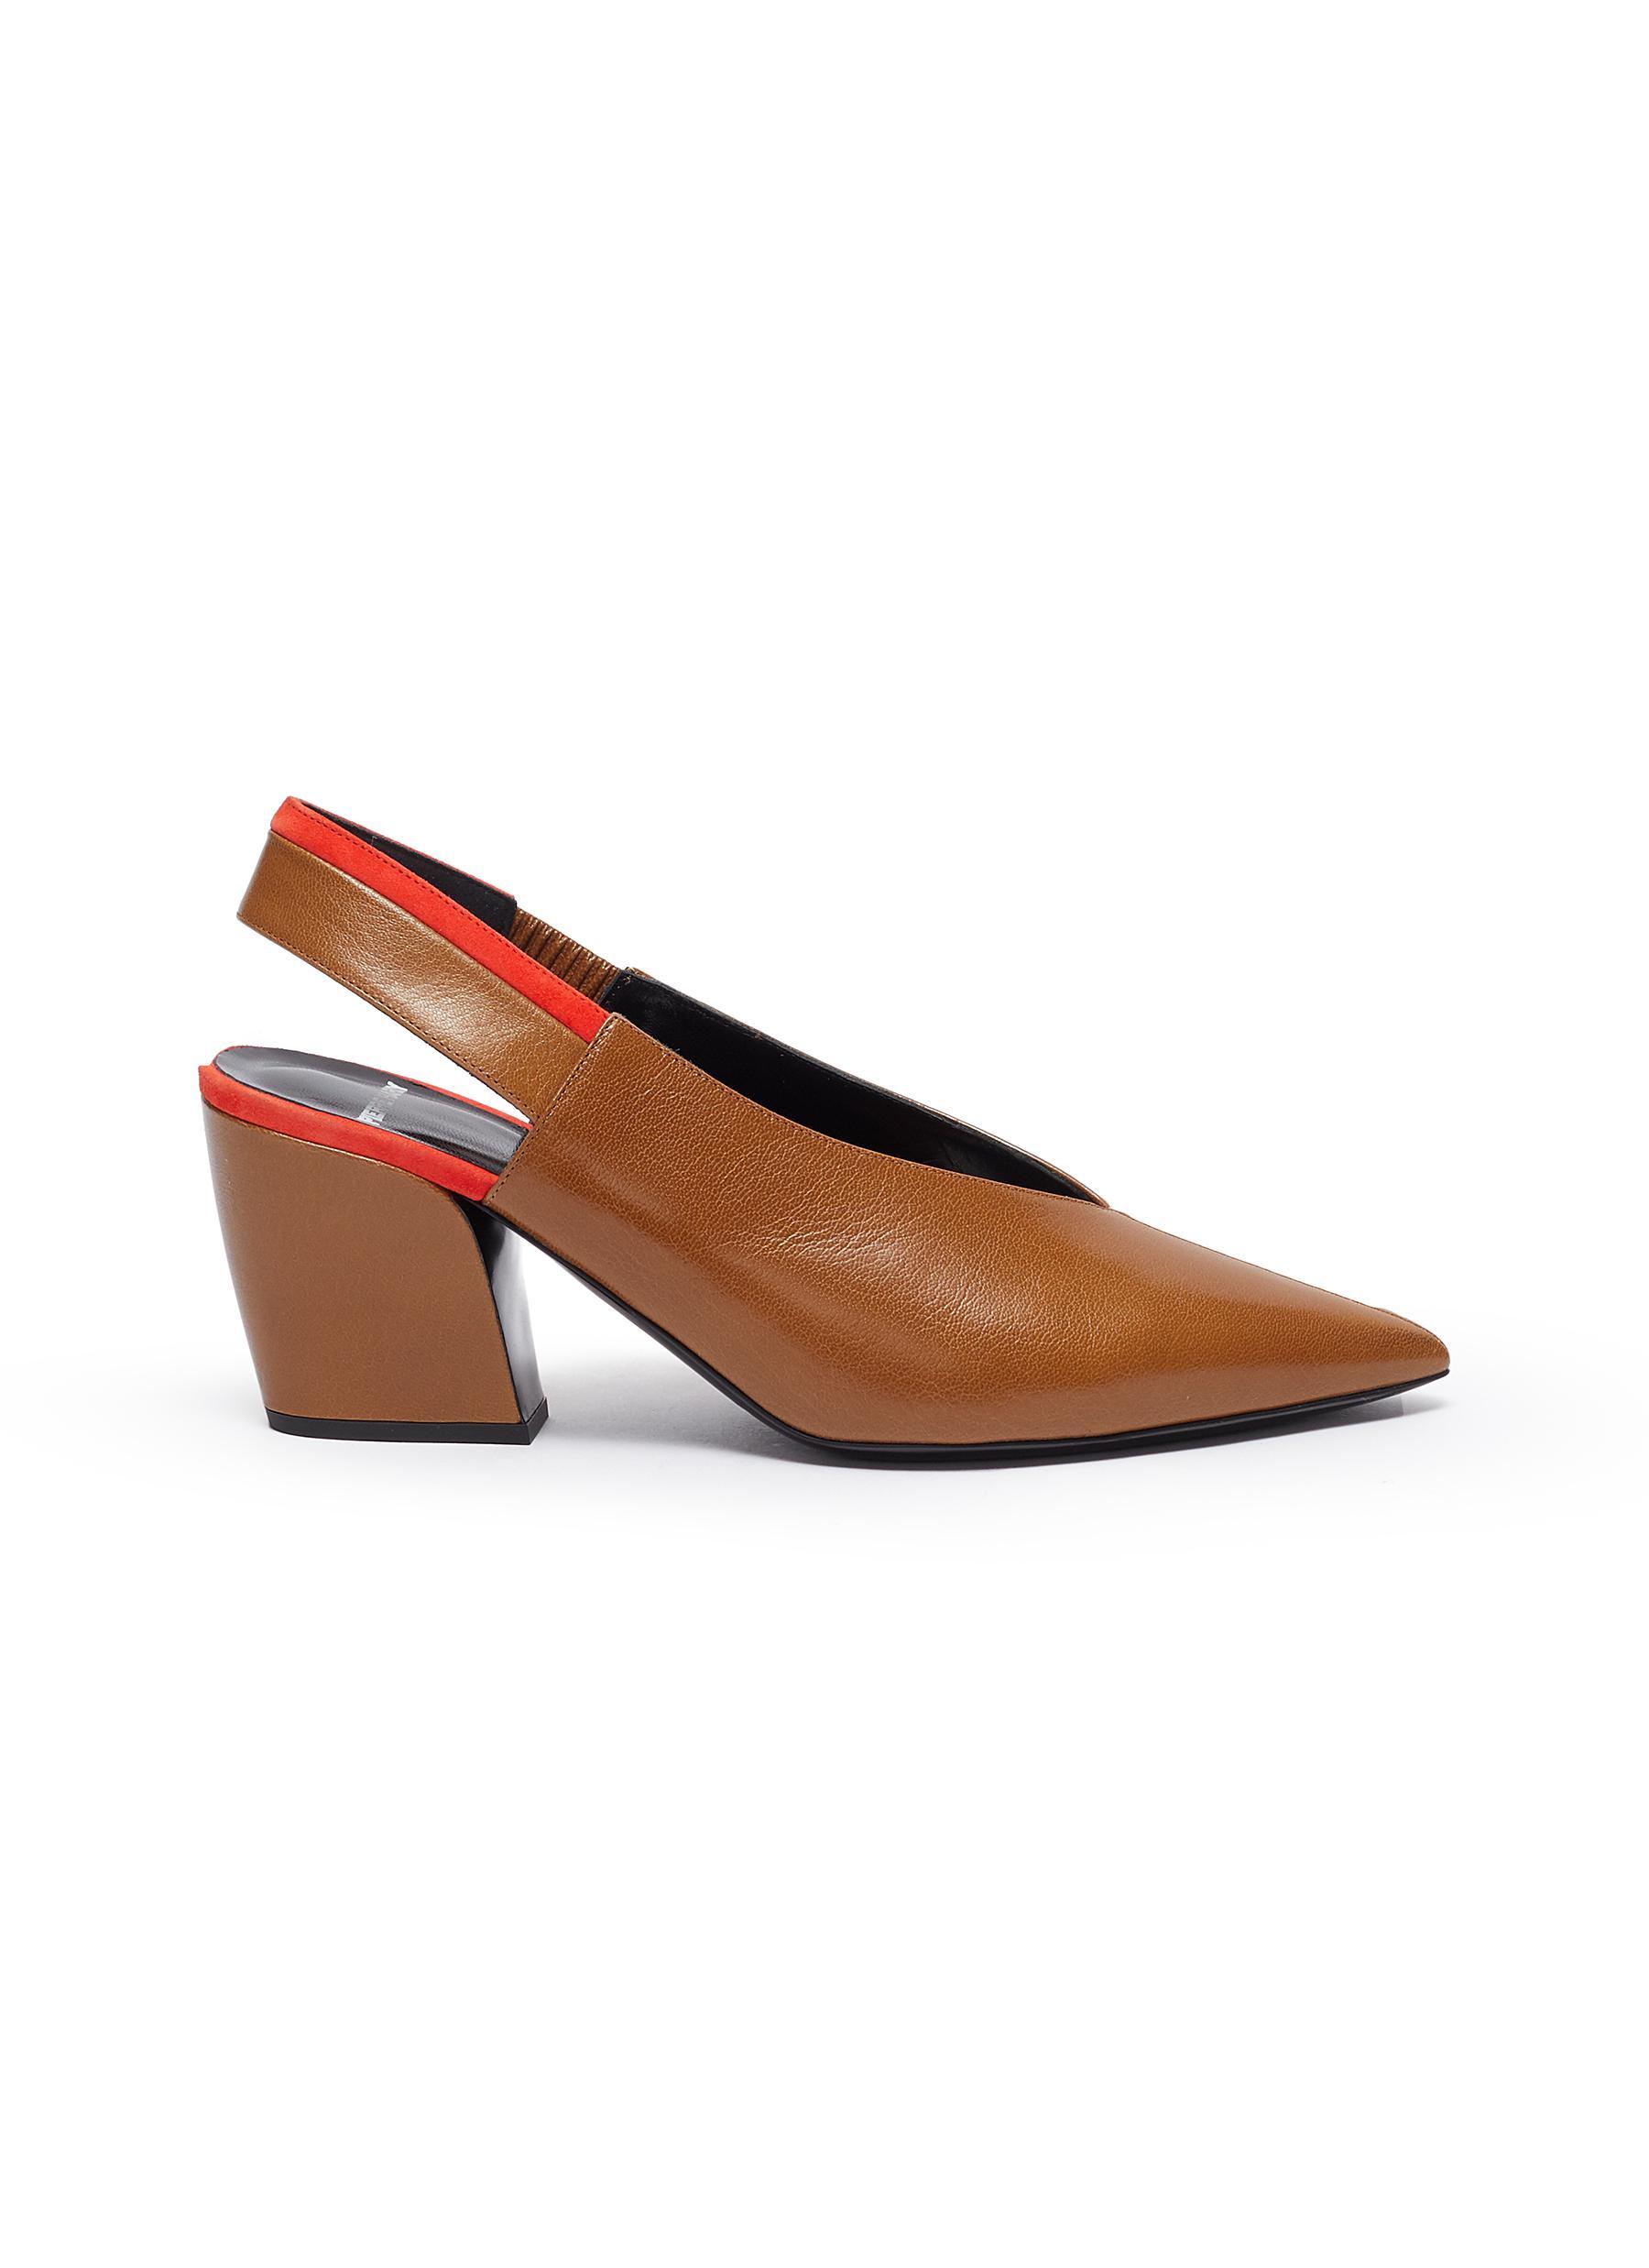 Pierre Hardy Mid Heels Alpha slingback block heel shoes